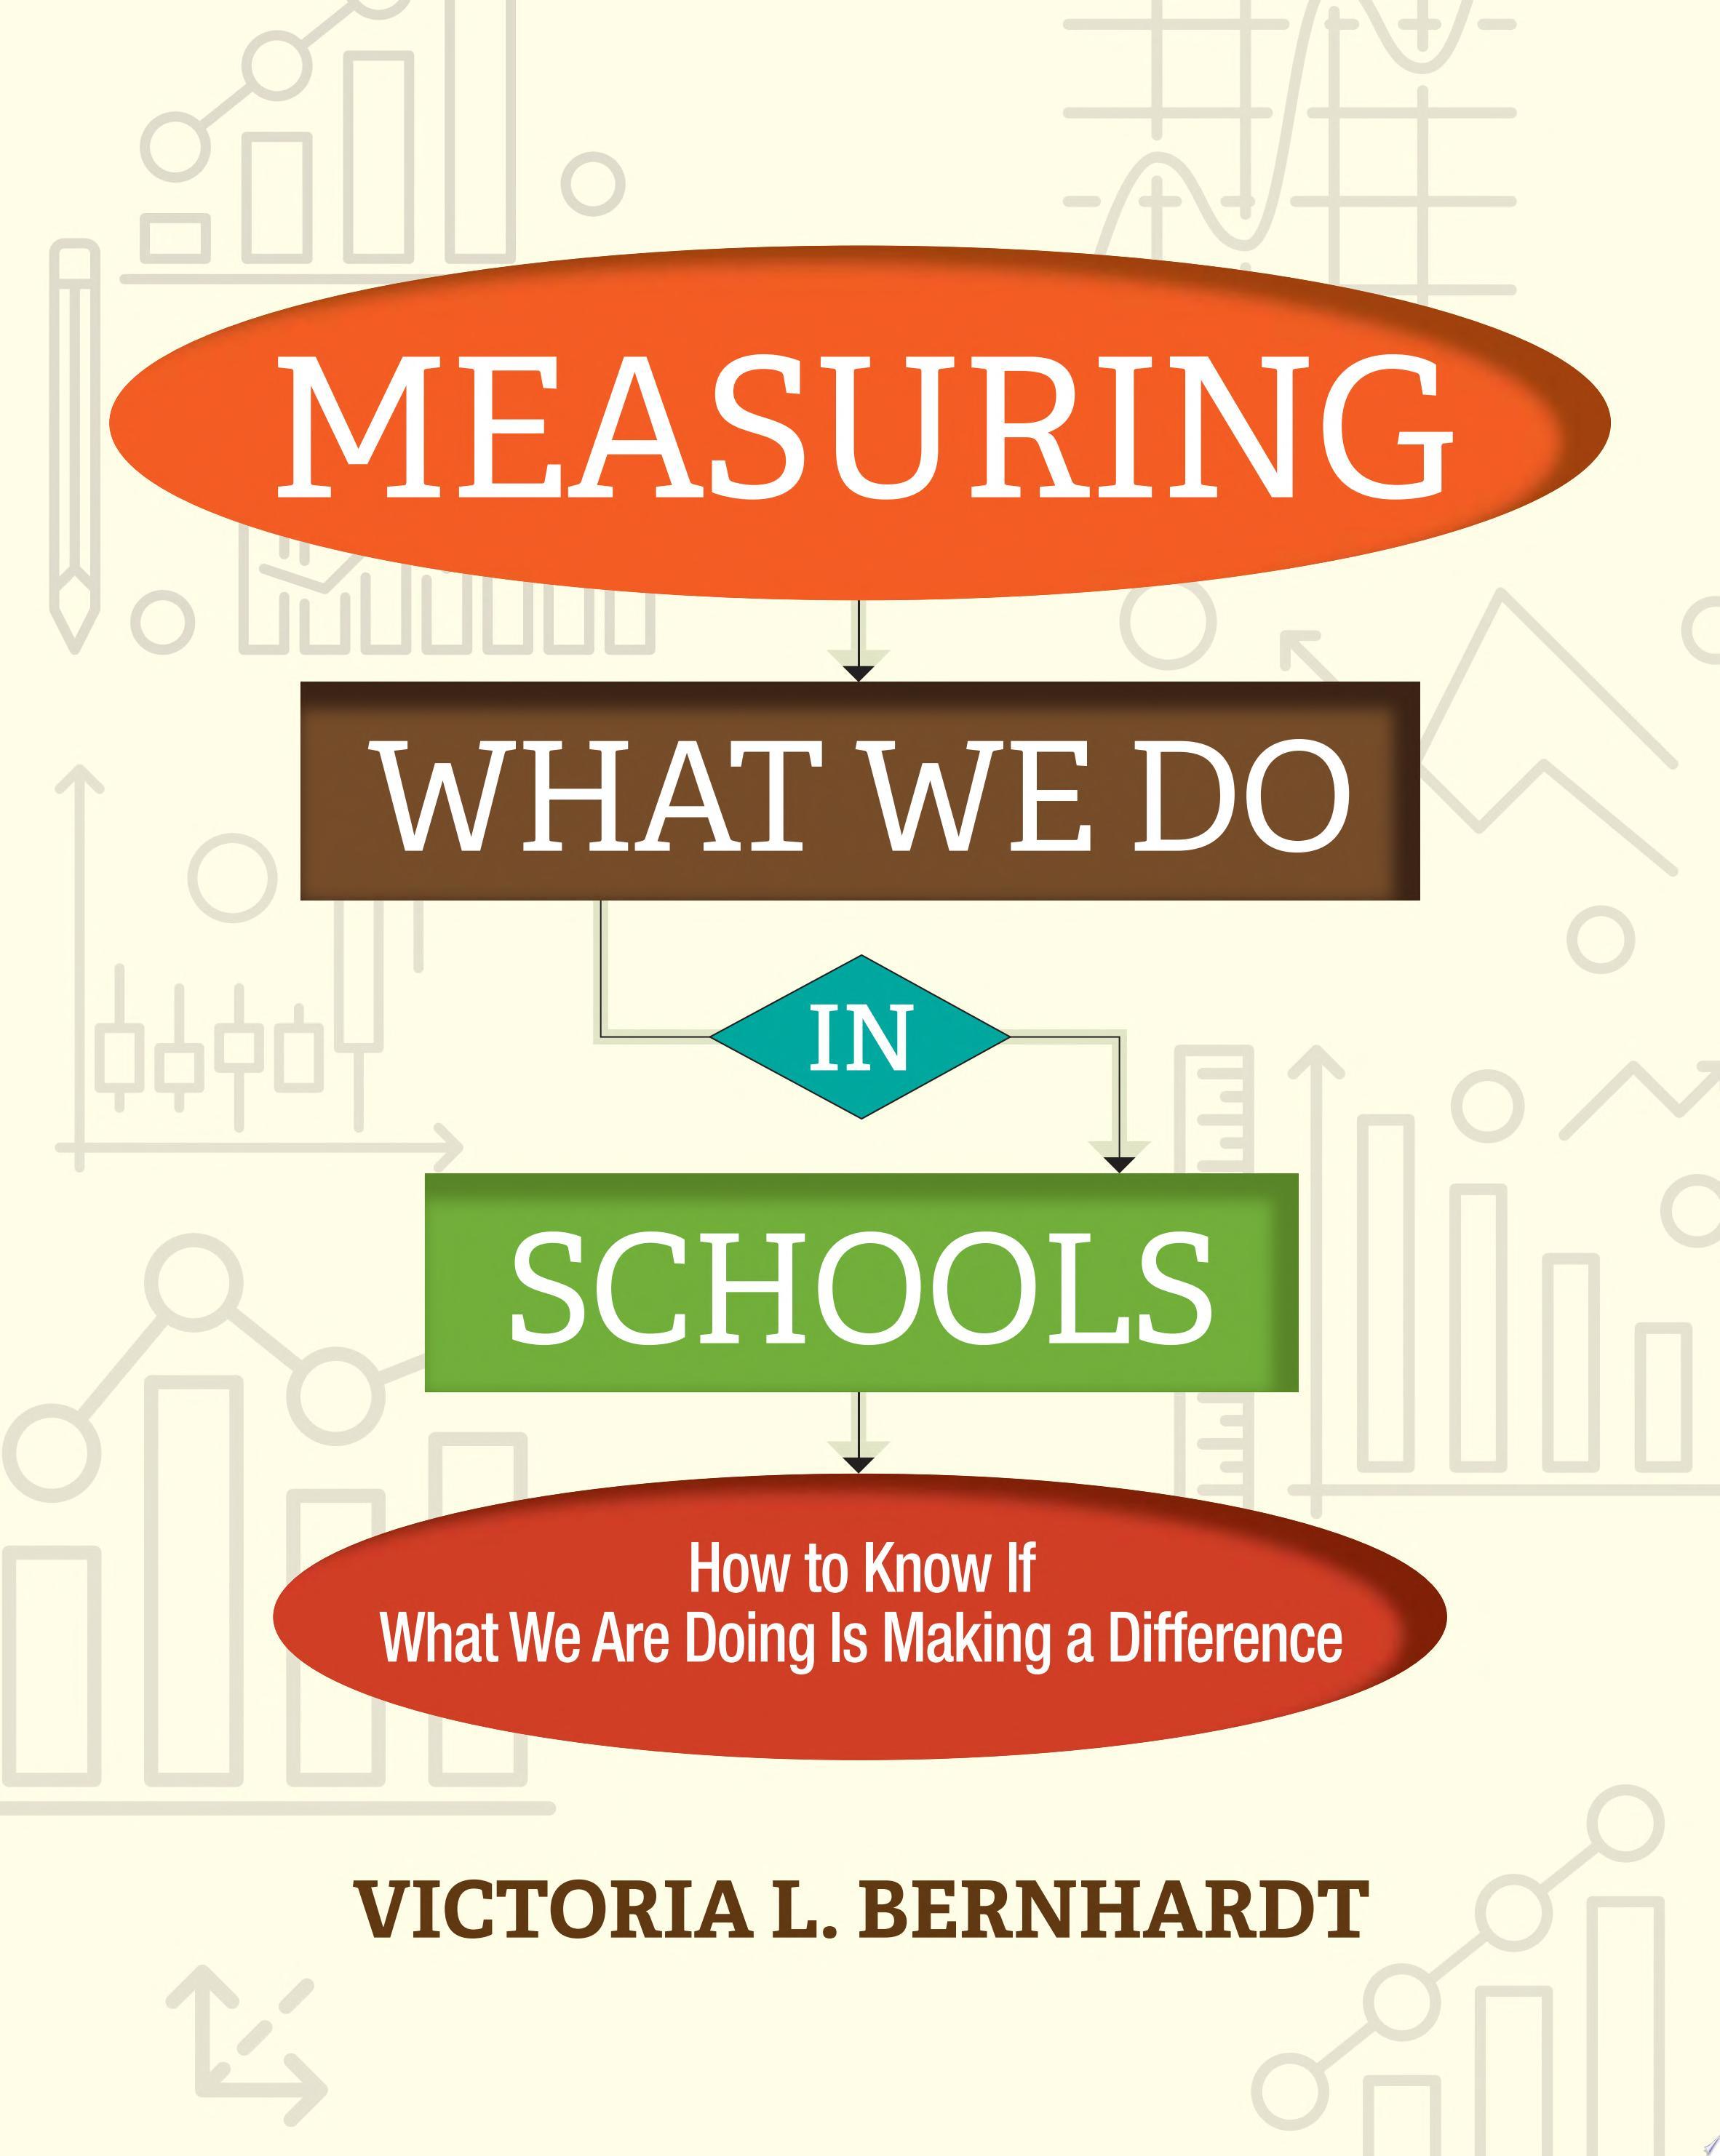 Measuring What We Do in Schools